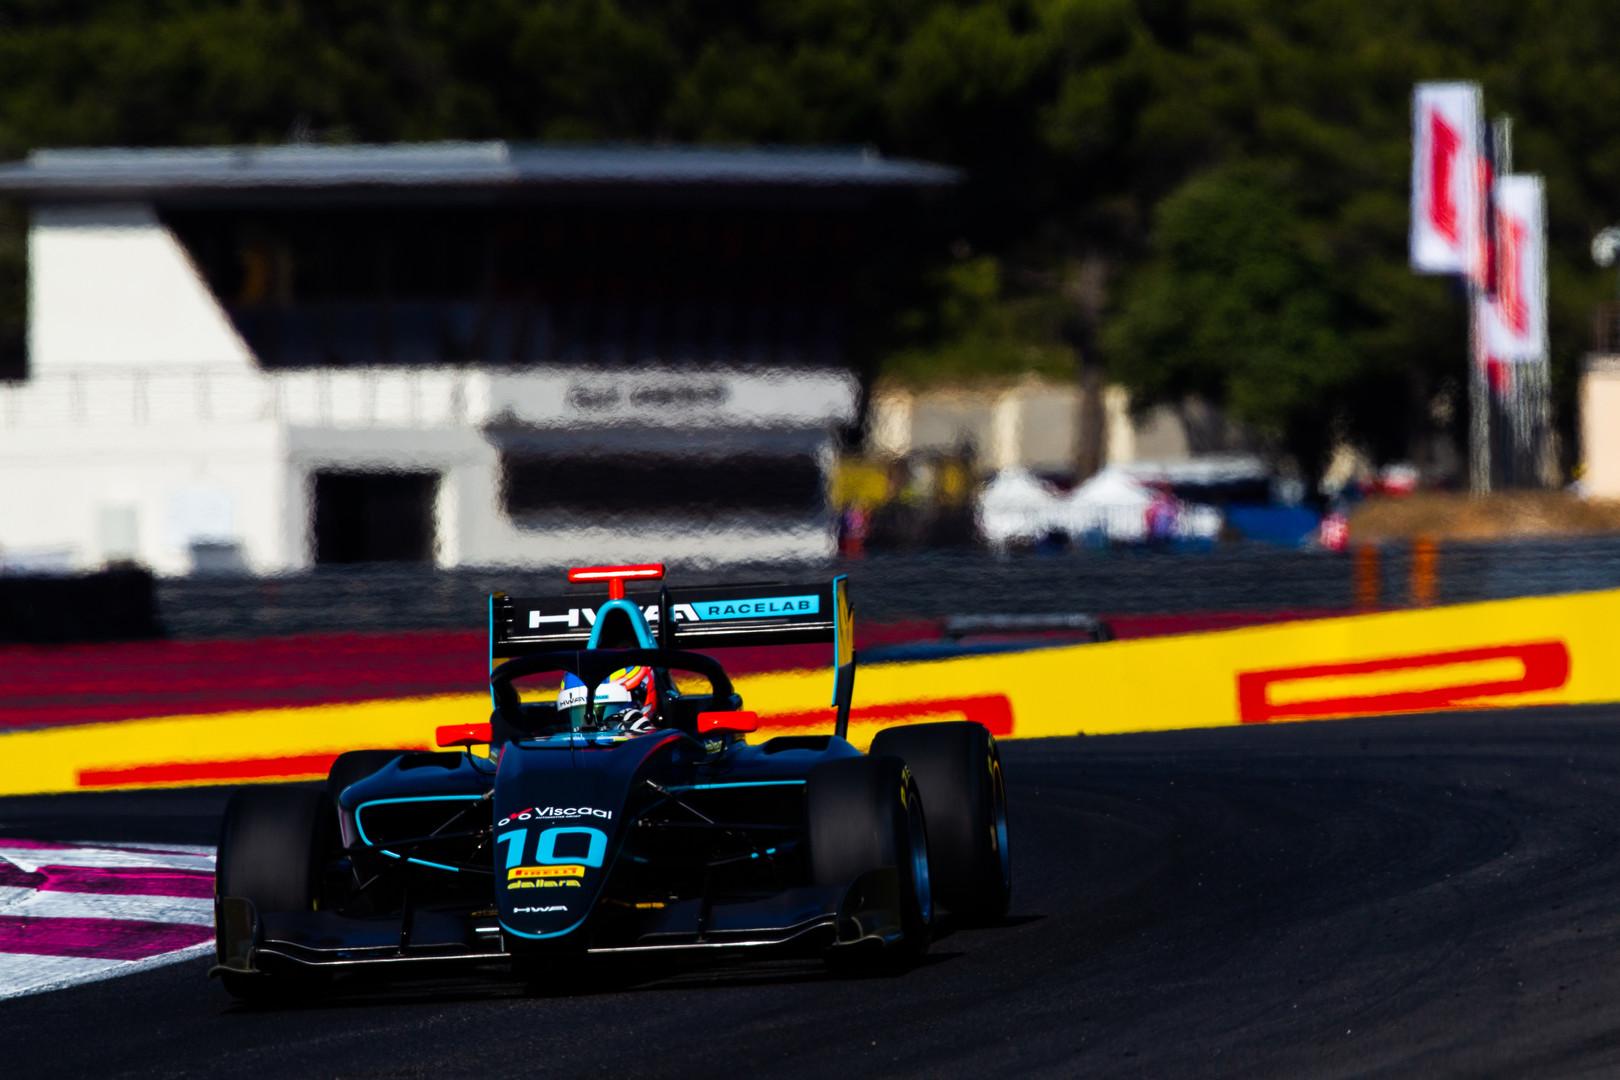 Bent F3 Paul Ricard 23-06-2019-17.jpg